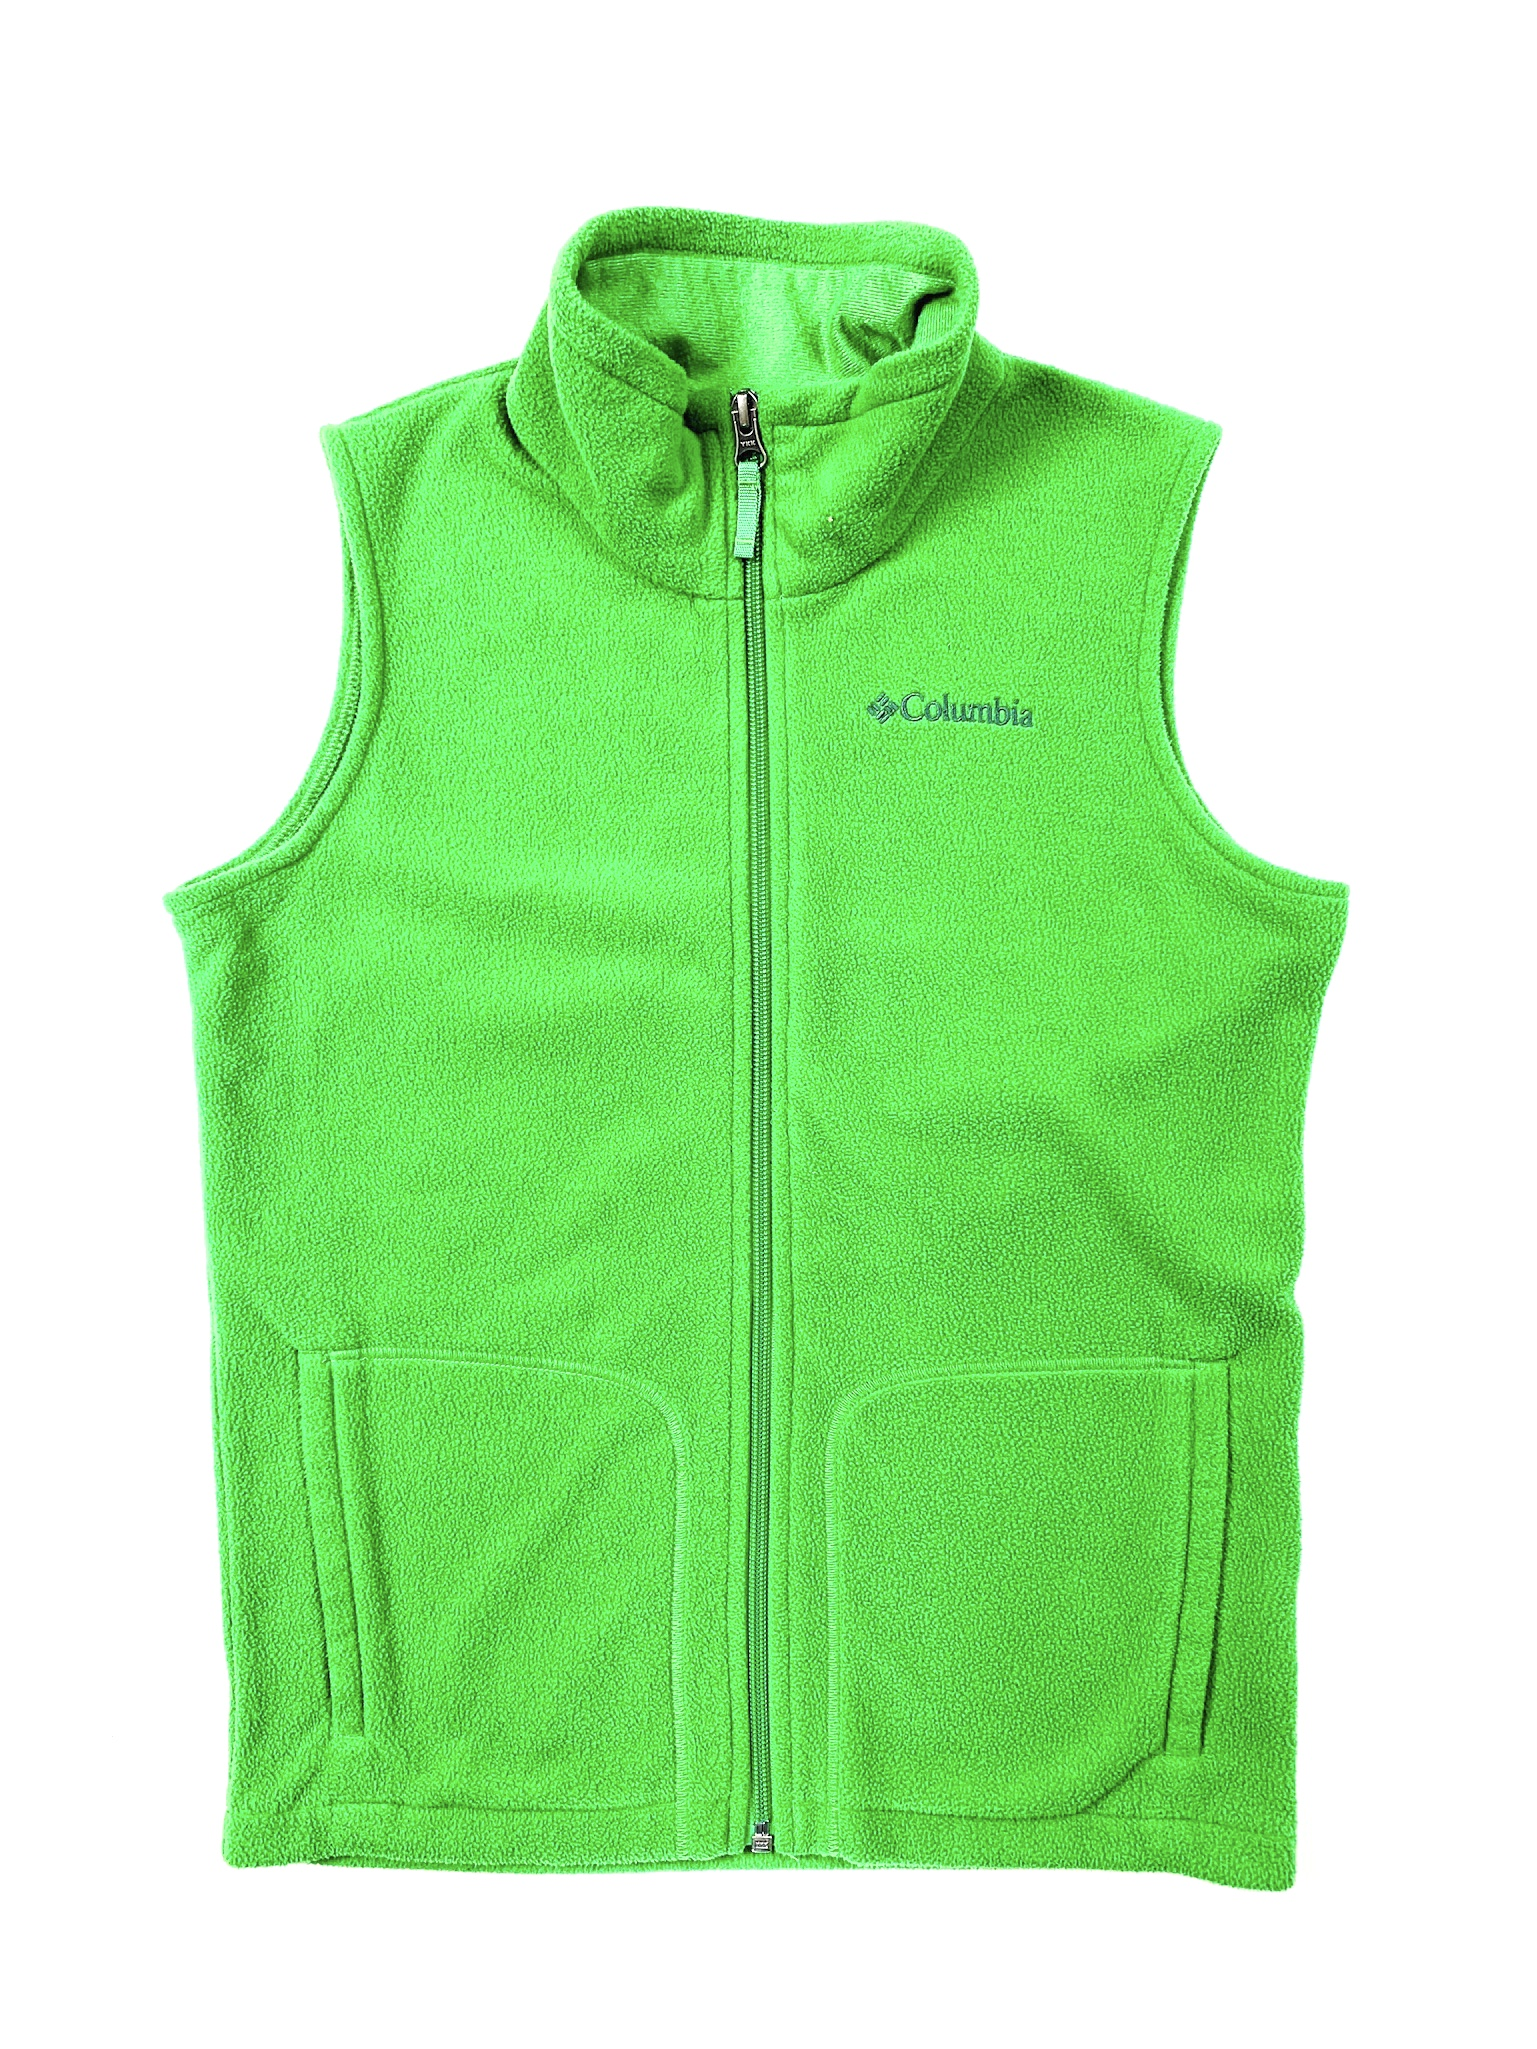 Columbia 10 Outerwear